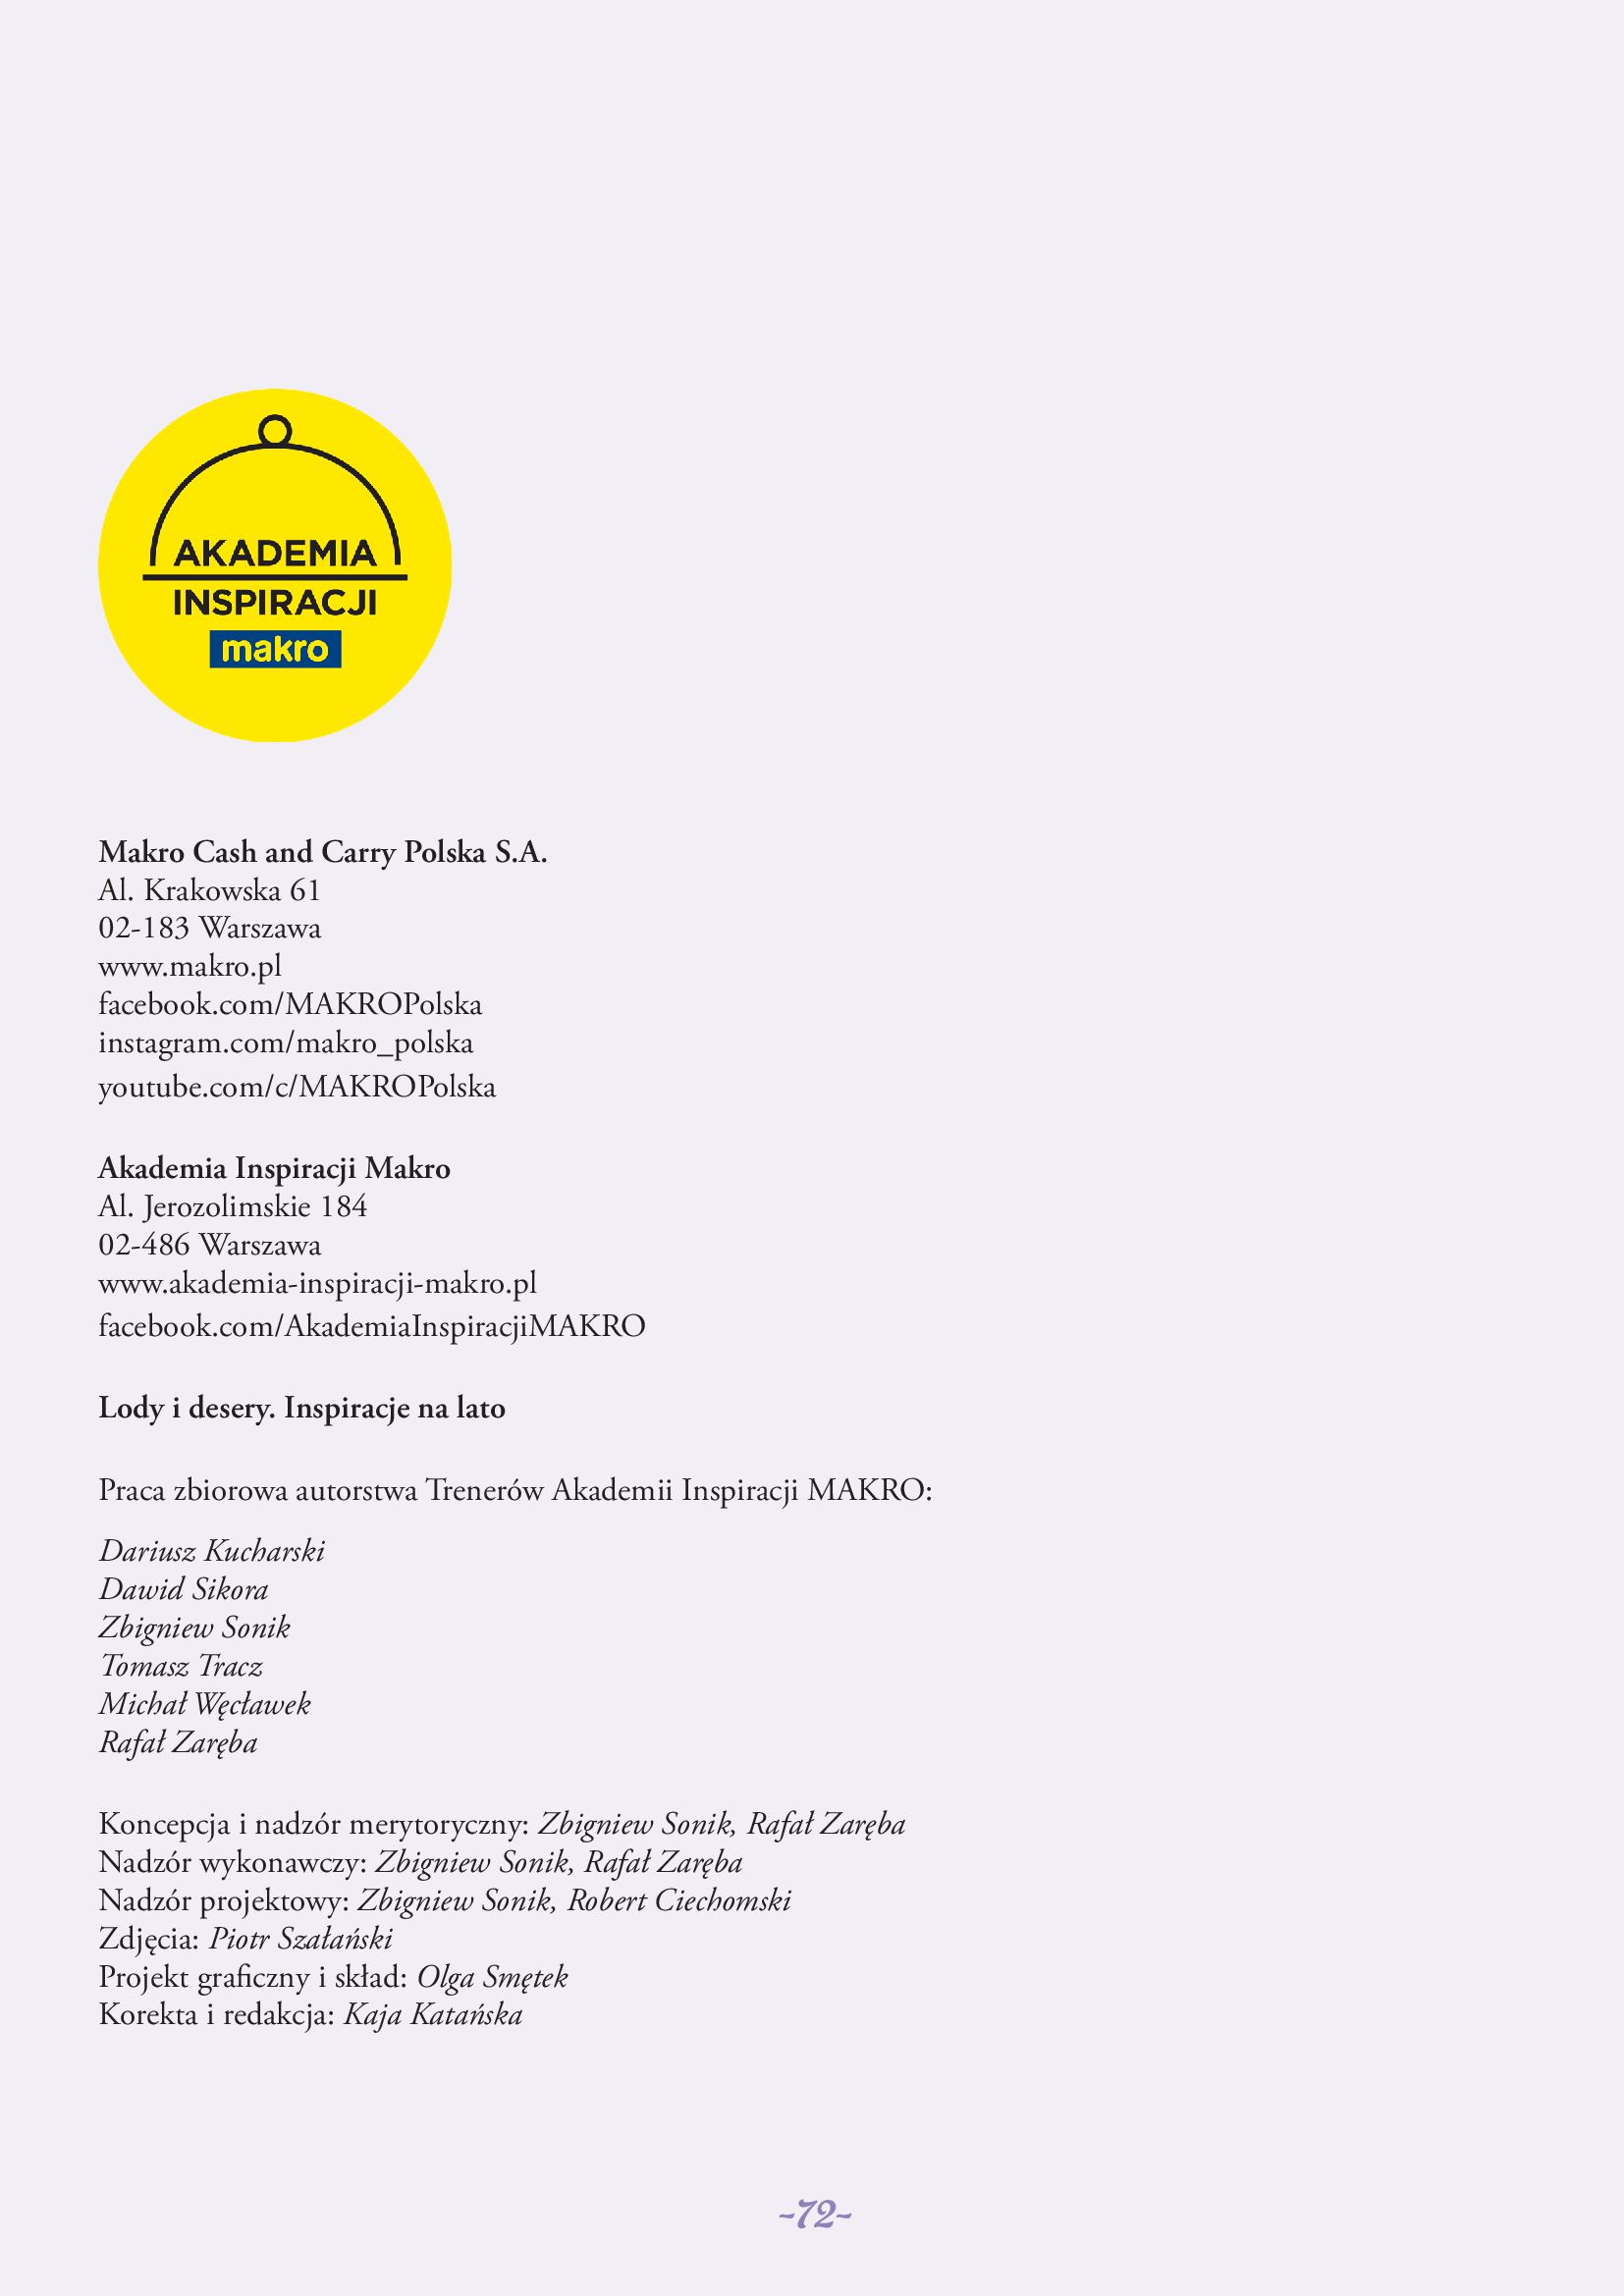 Gazetka Makro: Gazetka Makro - lody i desery 2021-05-21 page-72